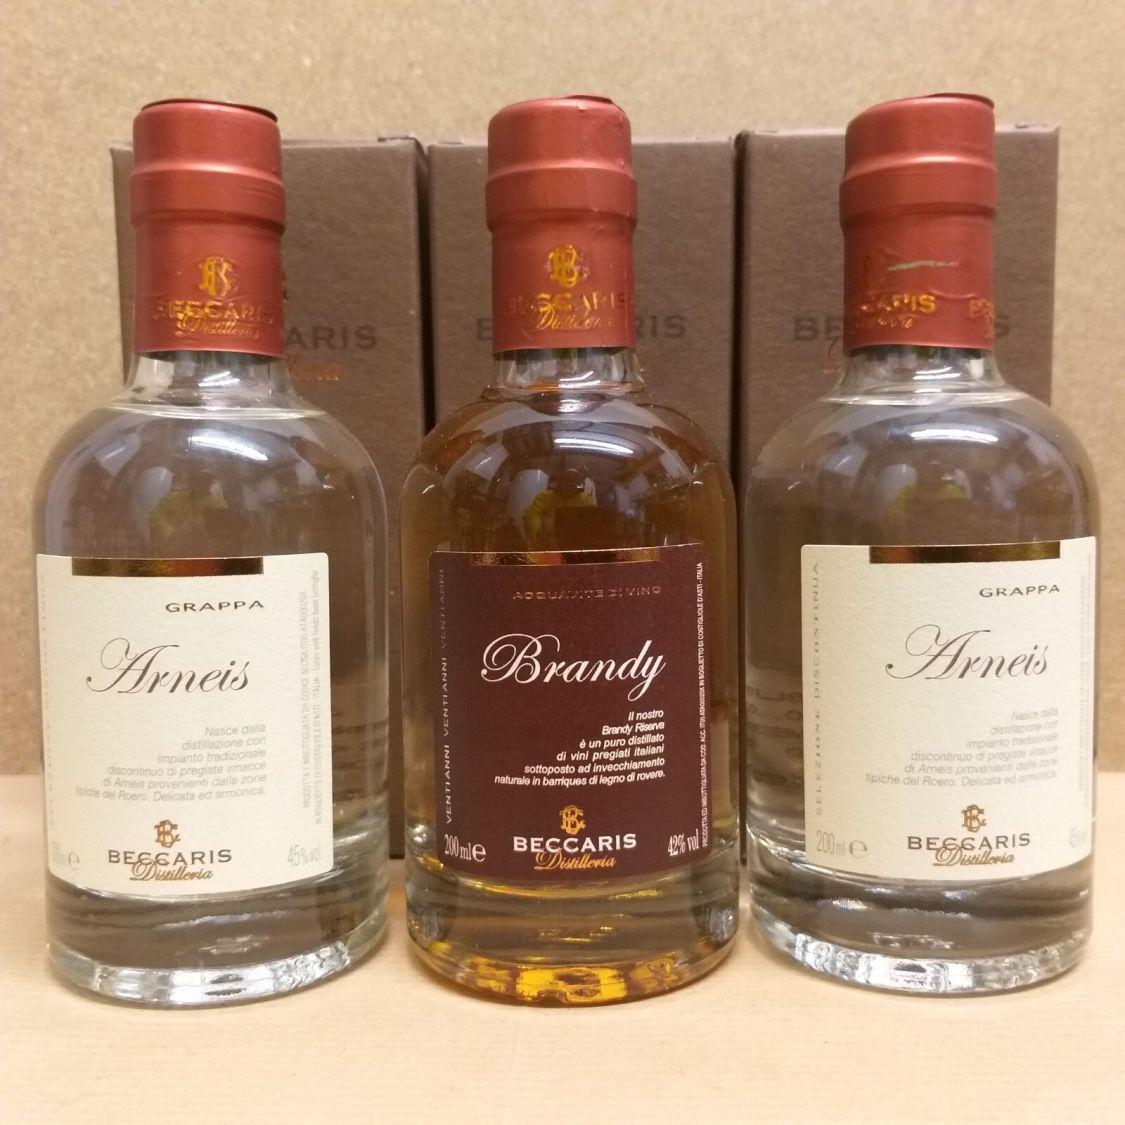 Beccaris Arneis Grappa 45 % Alkohol und Beccaris Brandy 42 % Alkohol 3 Flaschen